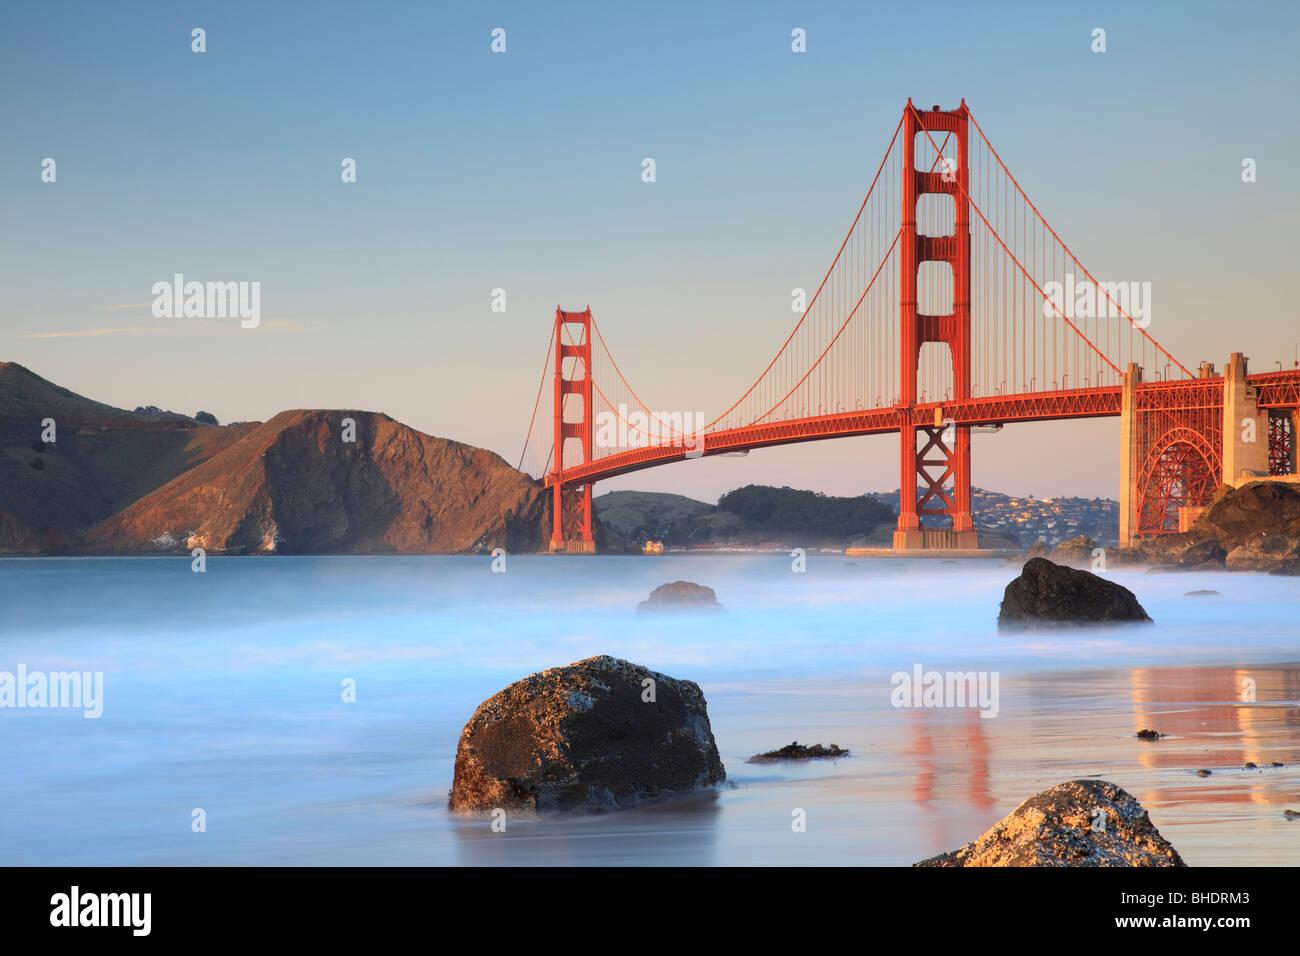 Golden Gate Bridge viewed from Bakers Beach - Stock Image